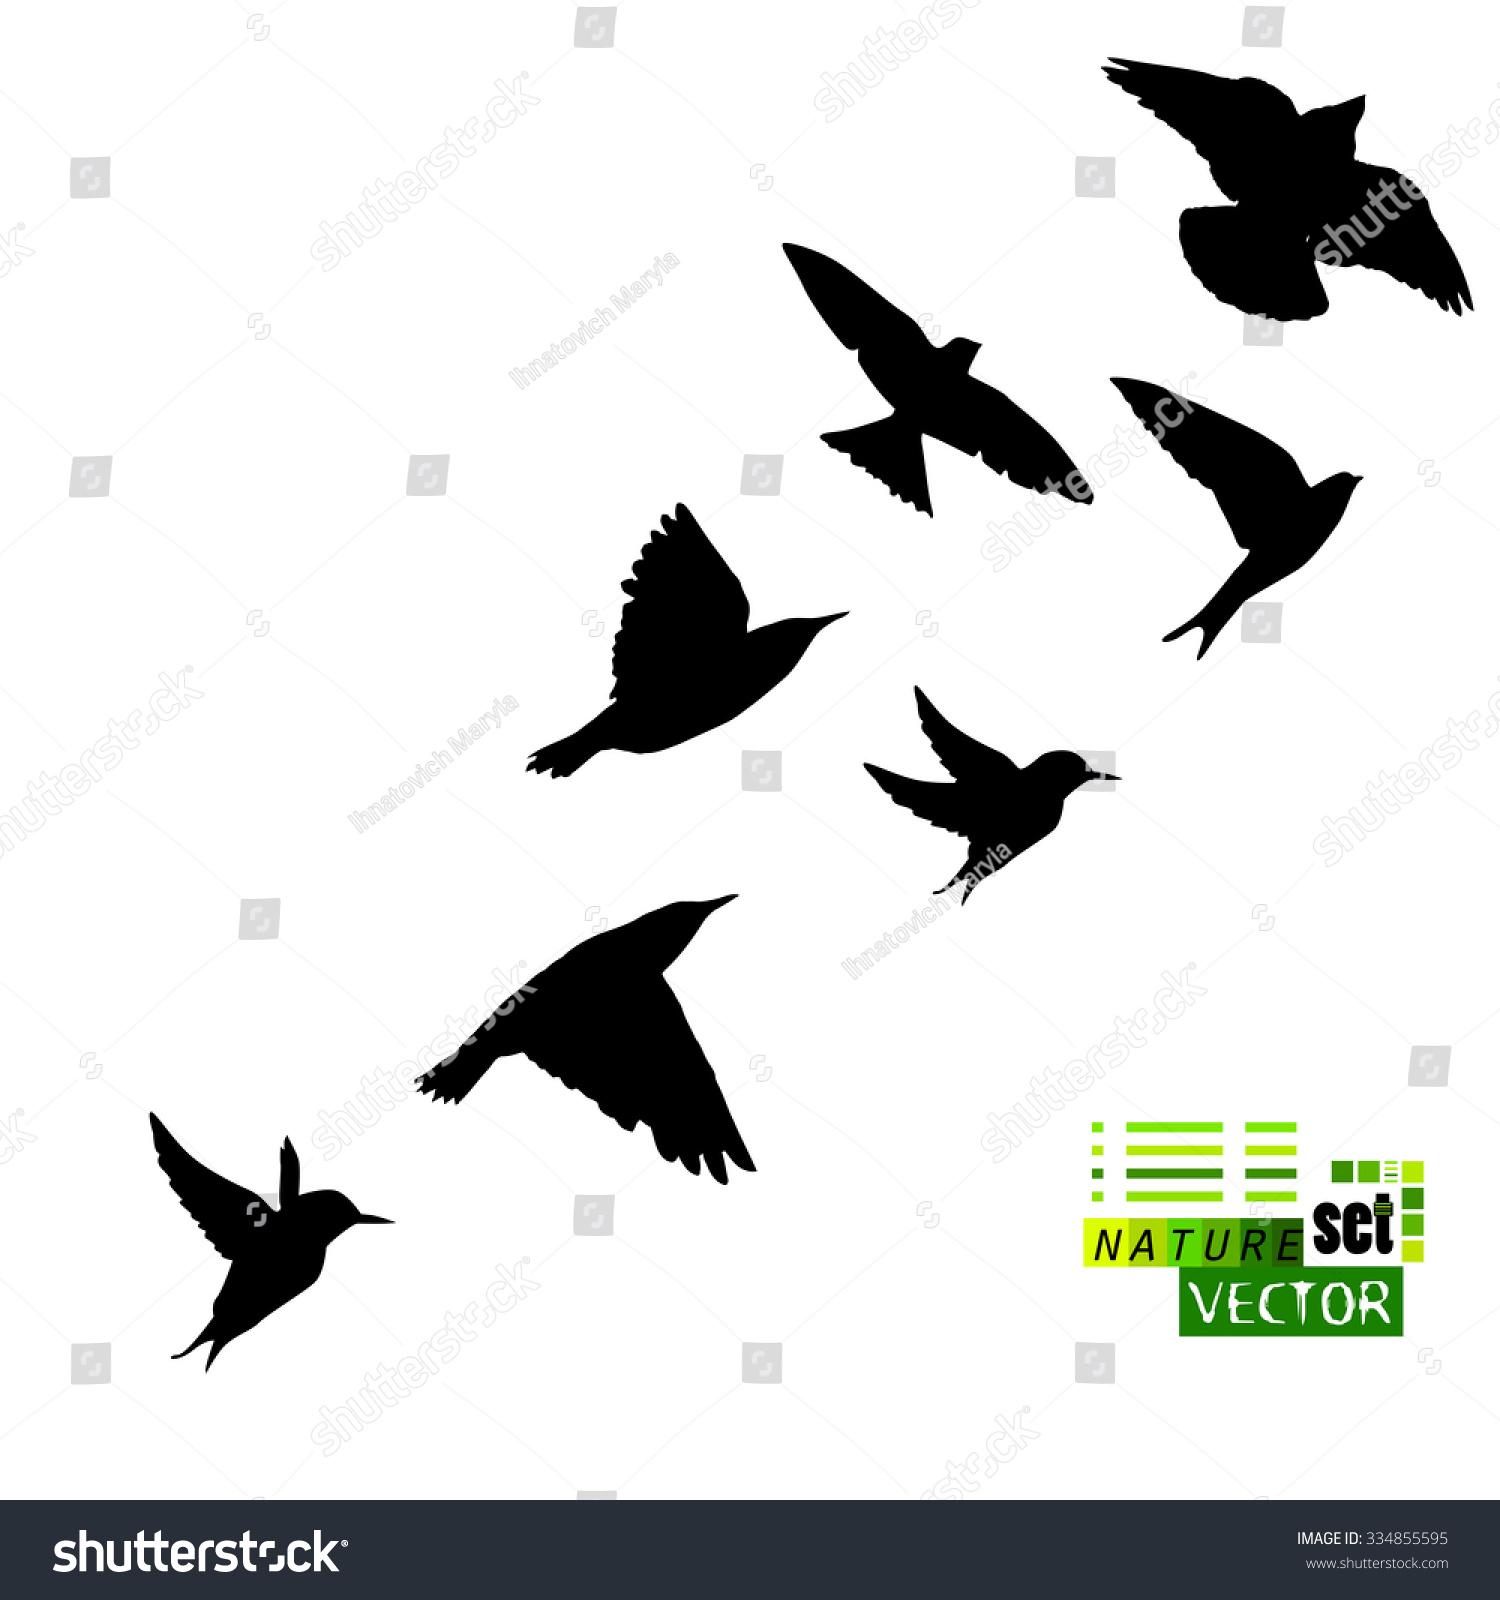 Bird in flight silhouette - photo#20